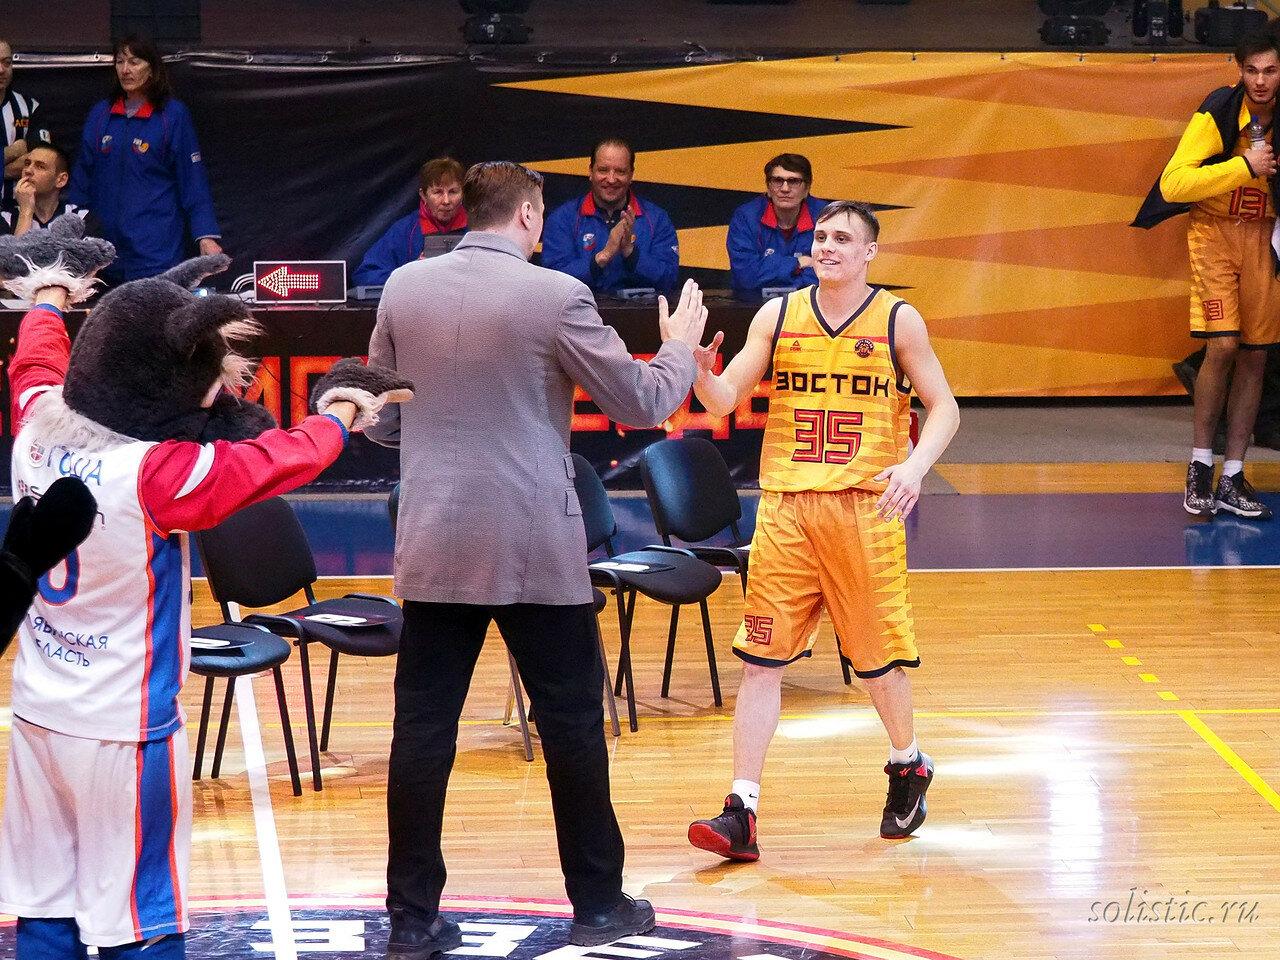 127 Матч звезд АСБ 2018 (ассоциации студенческого баскетбола)